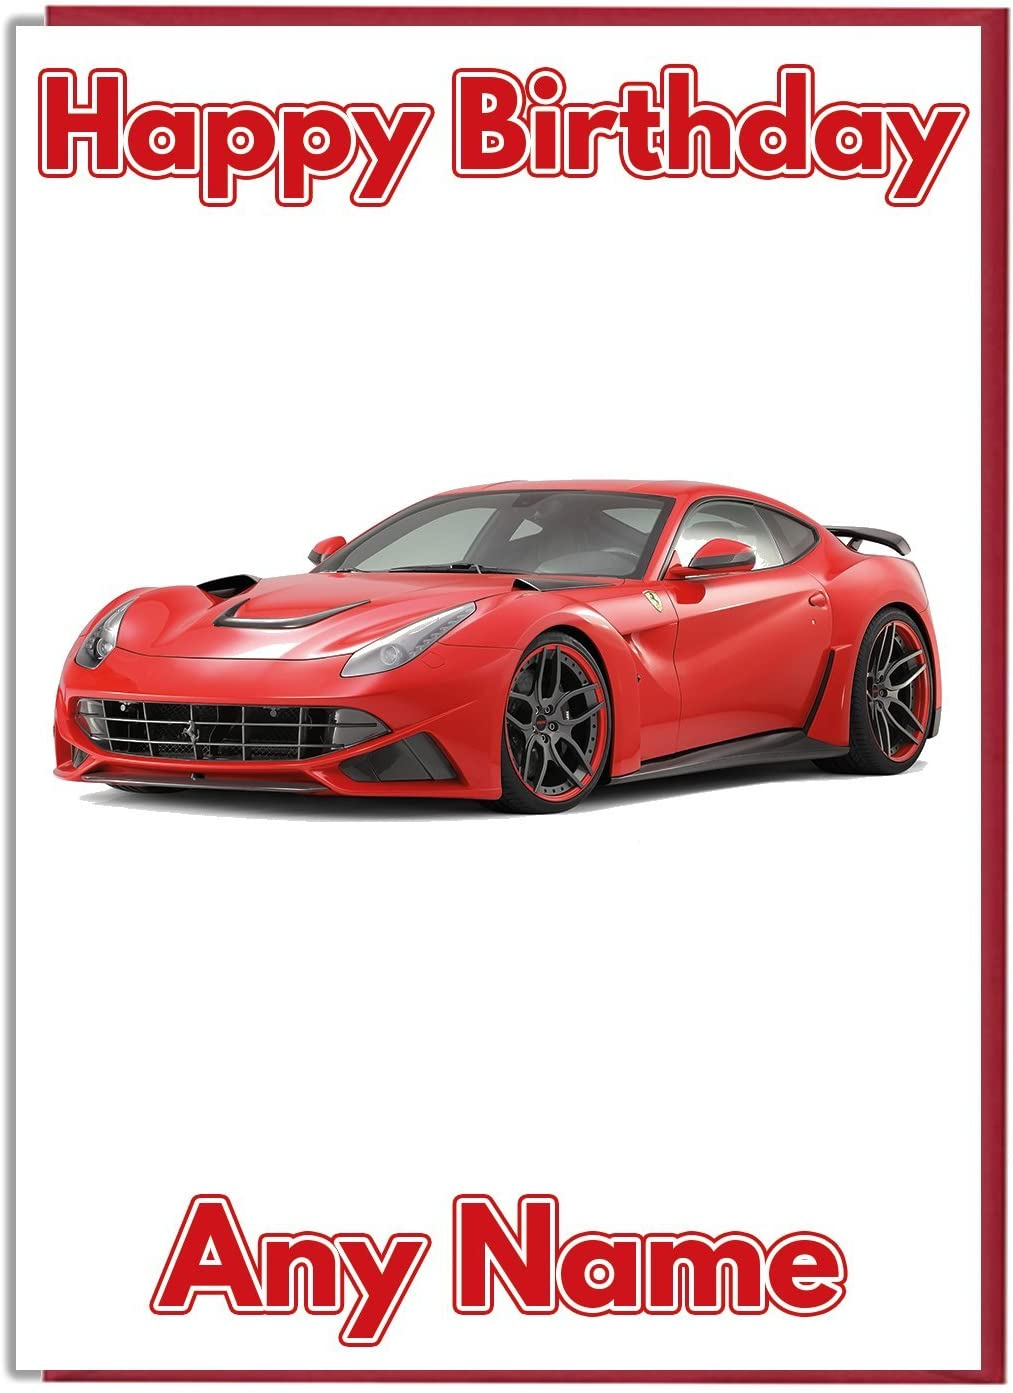 Sports Car Red Ferrari Premium Ivory Personalised Birthday Card Amazon De Bürobedarf Schreibwaren